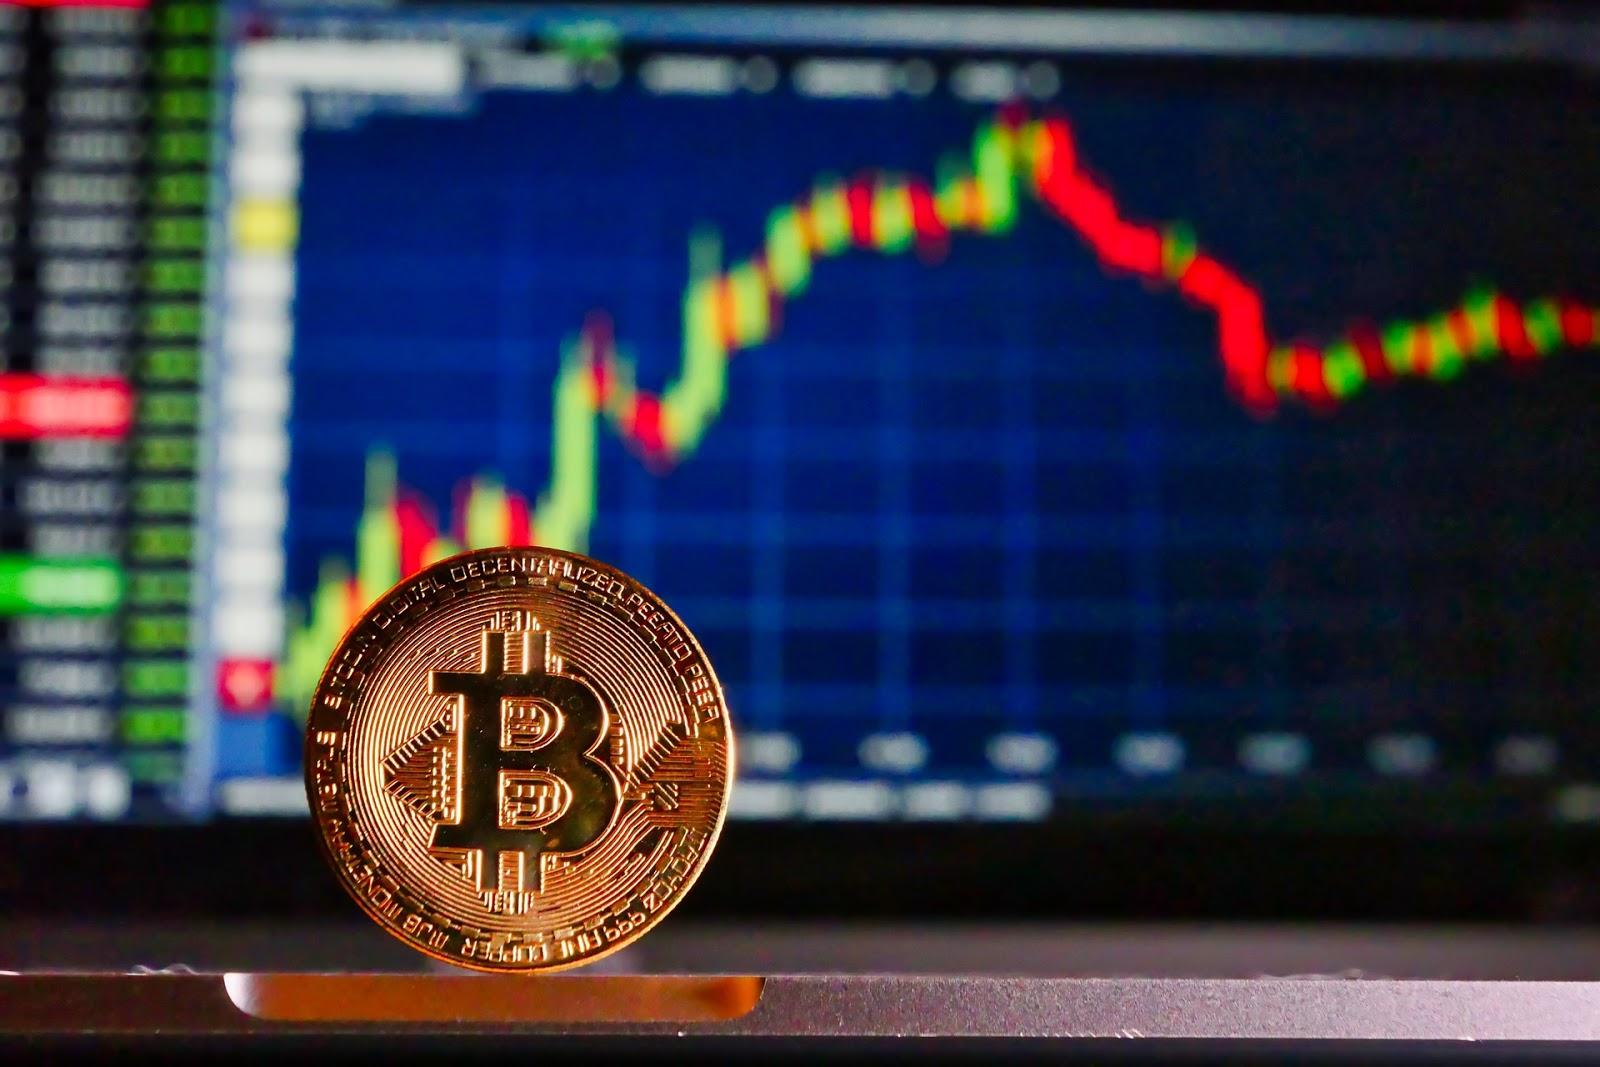 sistem perdagangan x5 cara trading mata uang digital